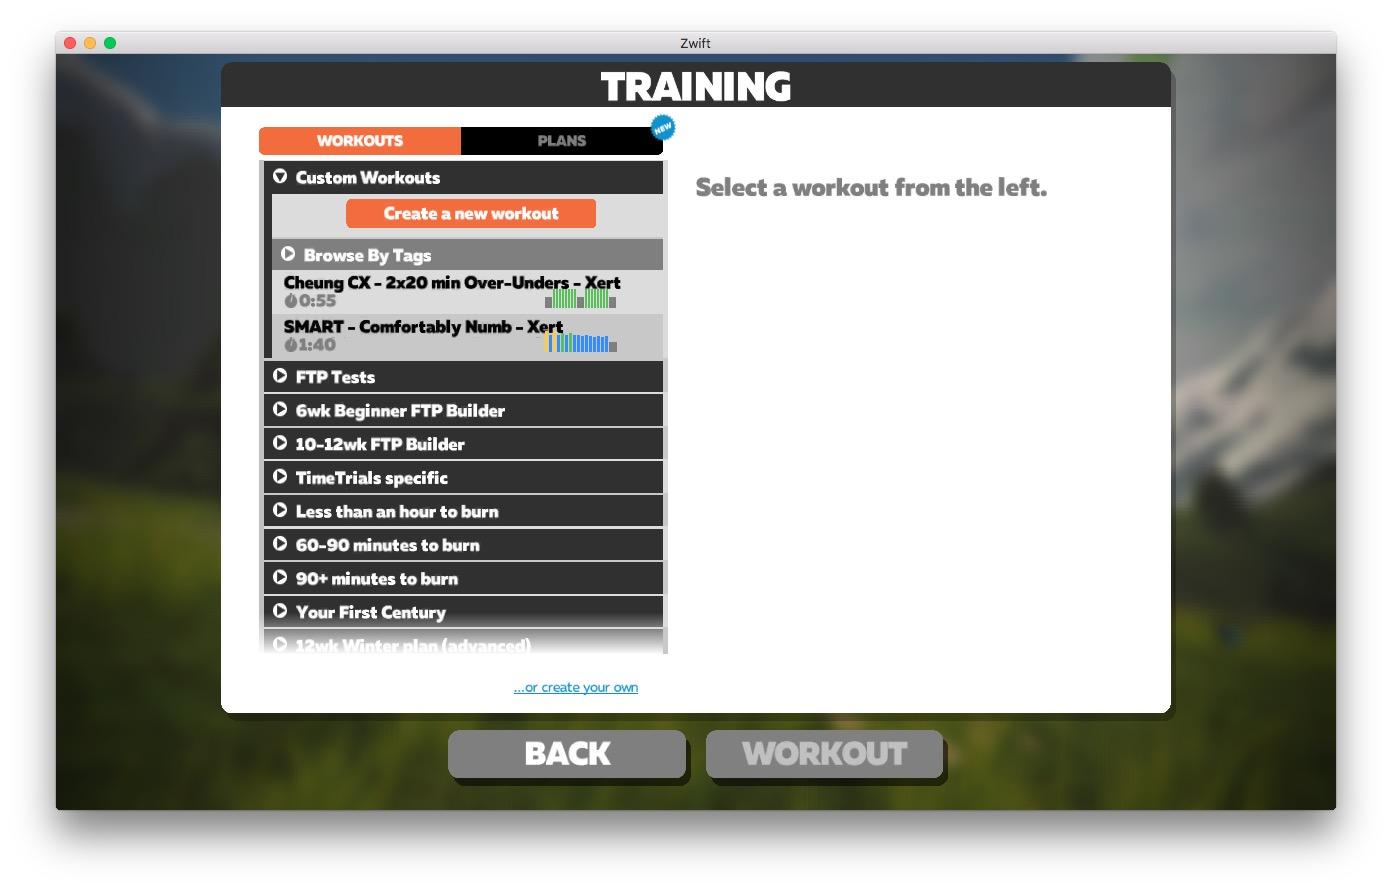 How to load Xert workouts to Zwift – Xert